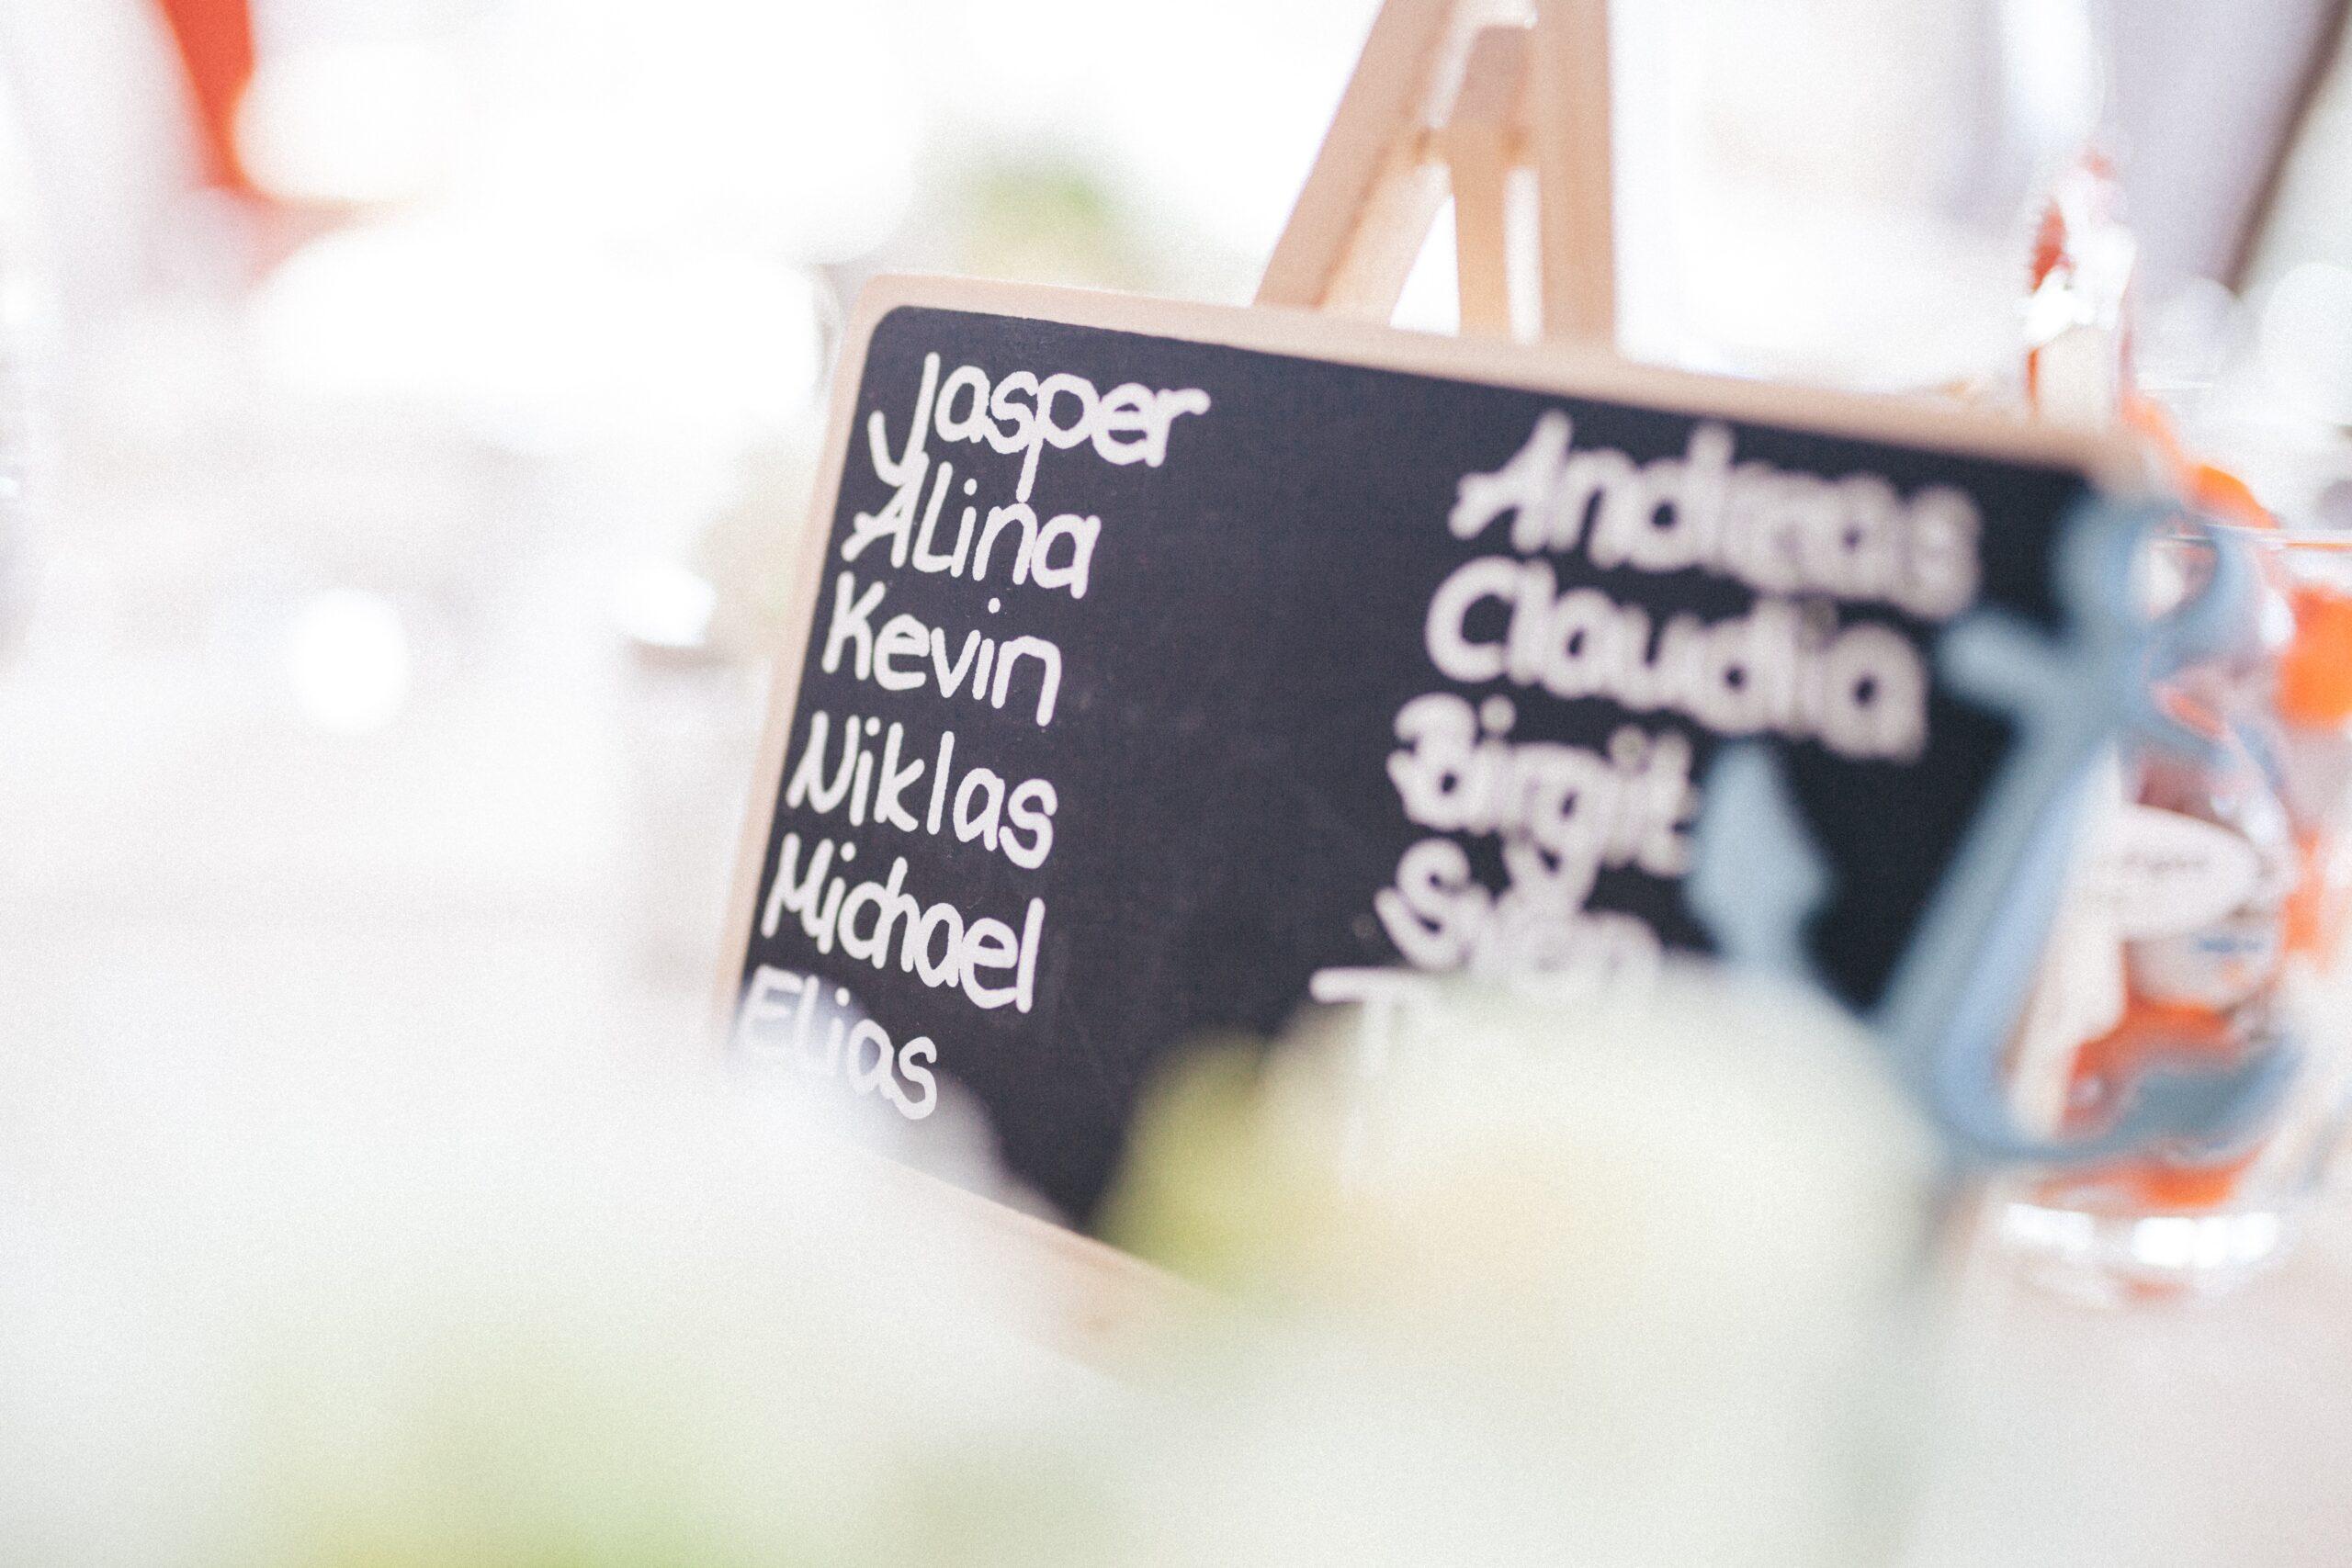 asper-alina-kevin-niklas-write-on-chalkboard